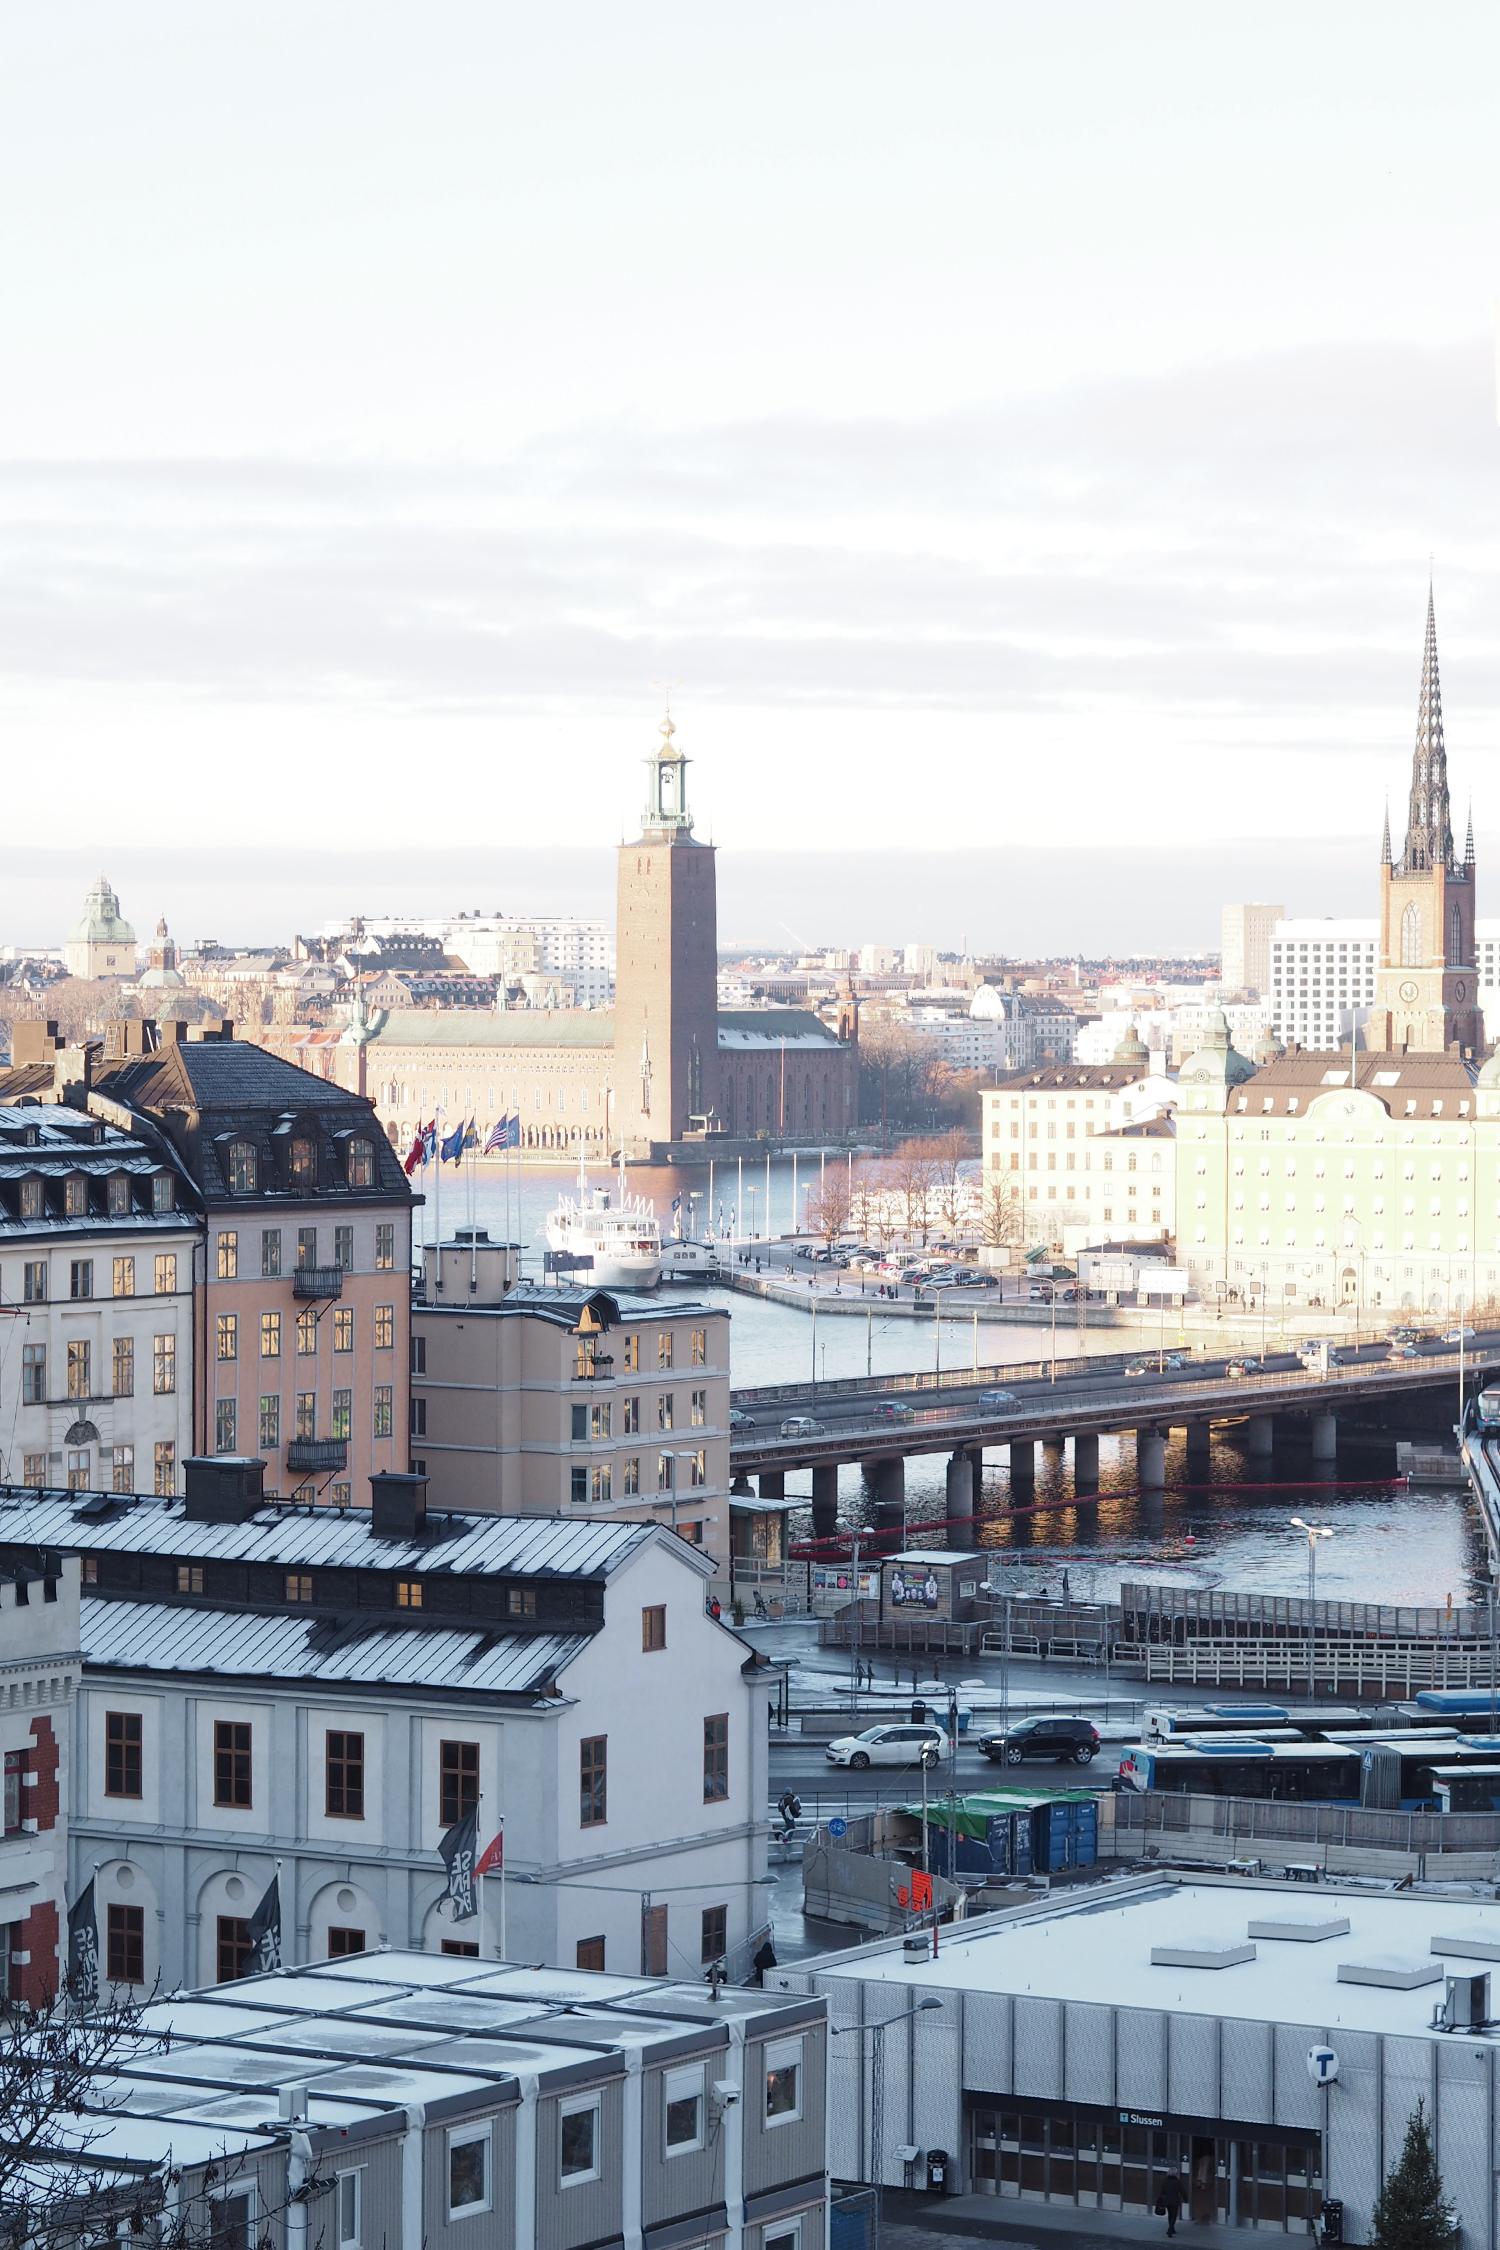 Char and the city, charandthecity.com, Tukholma, Stockholm, Fotografiska, Eriks Gondolen, Sture Gallerian